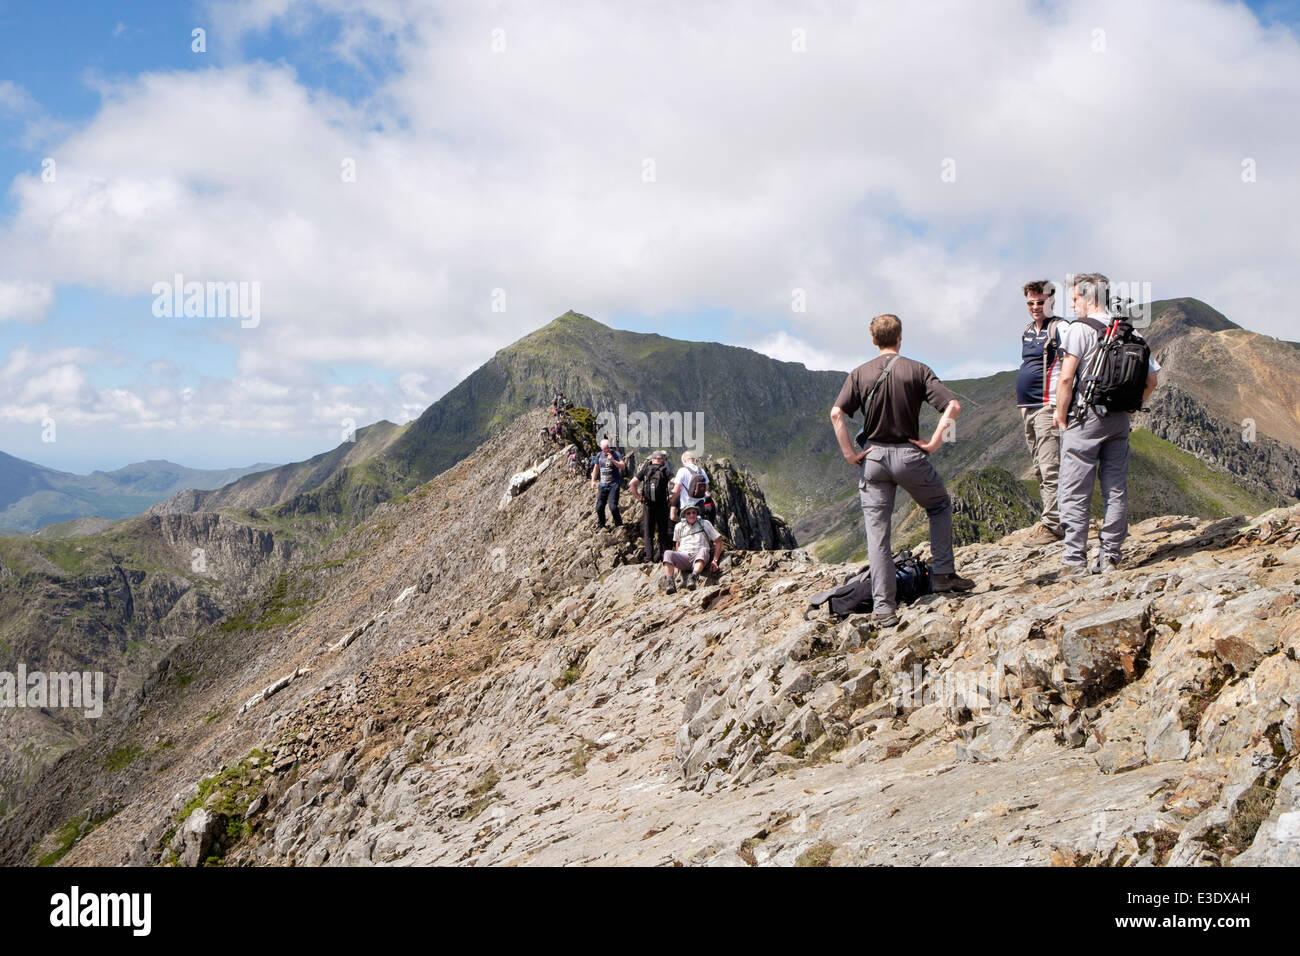 Hikers on Crib Goch knife edge ridge top scramble at start of Mount Snowdon Horseshoe in mountains of Snowdonia Stock Photo